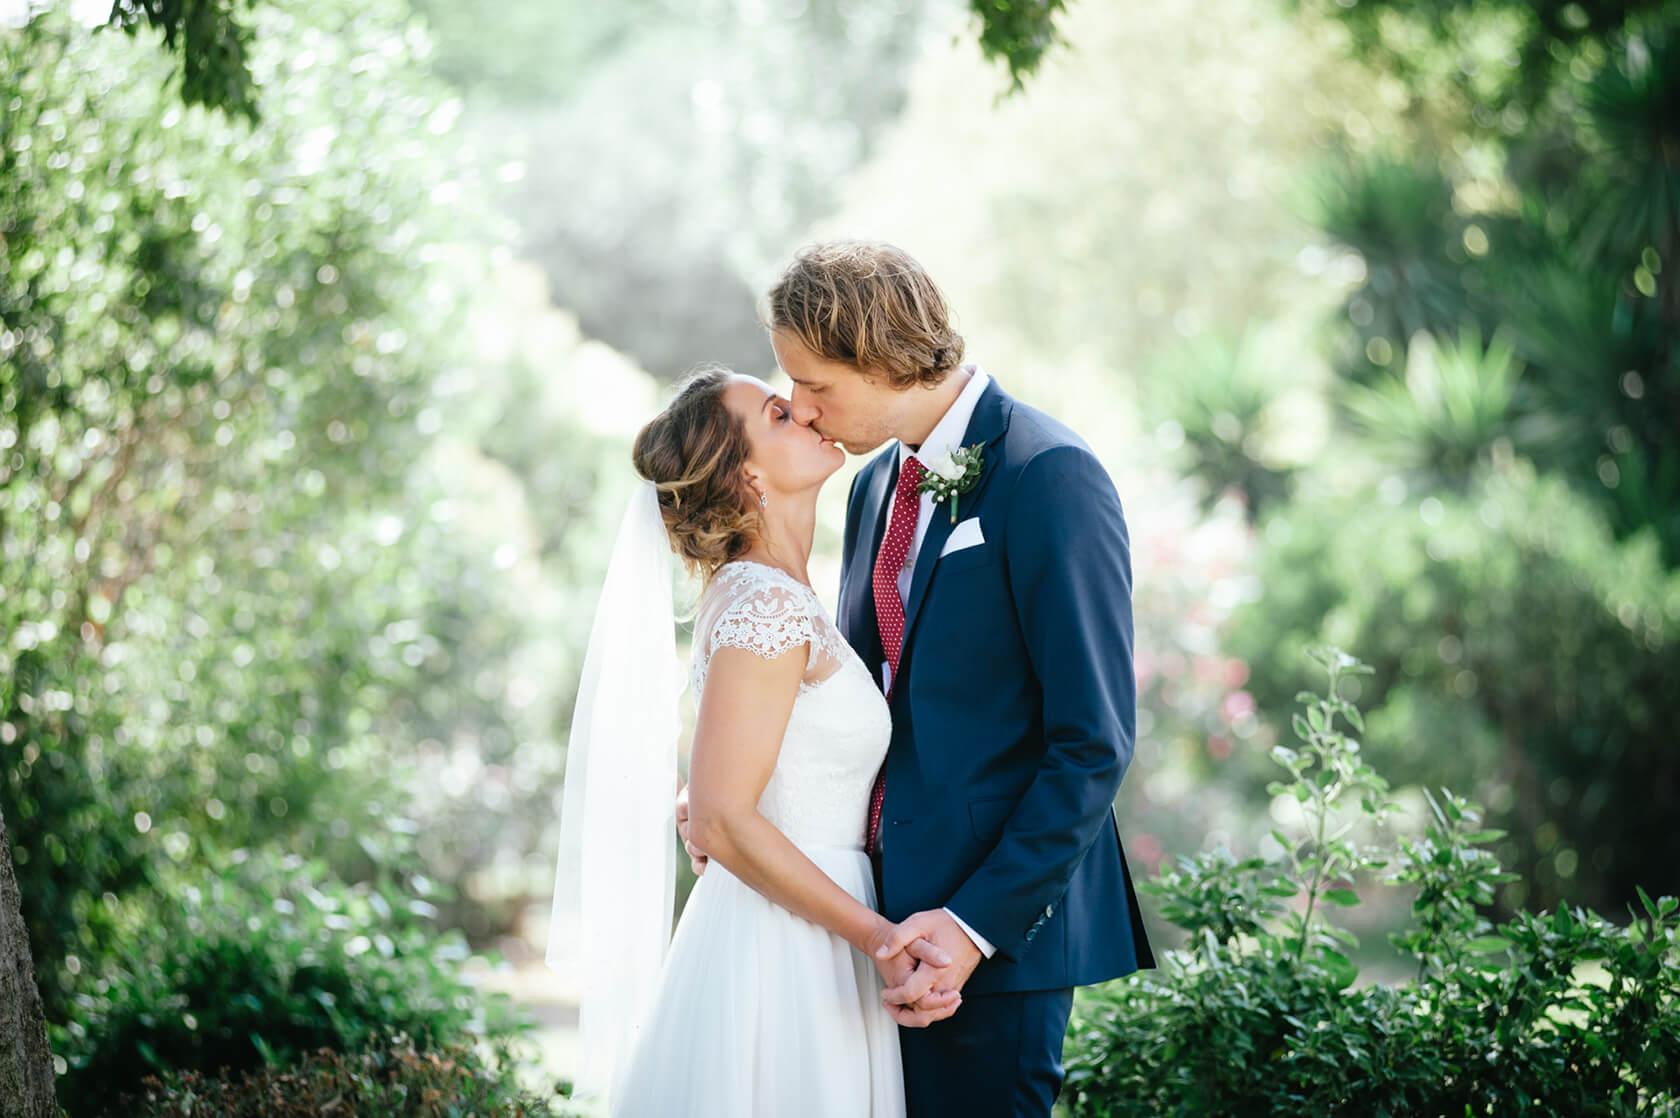 Fotografia Sitges Getting married in Spain